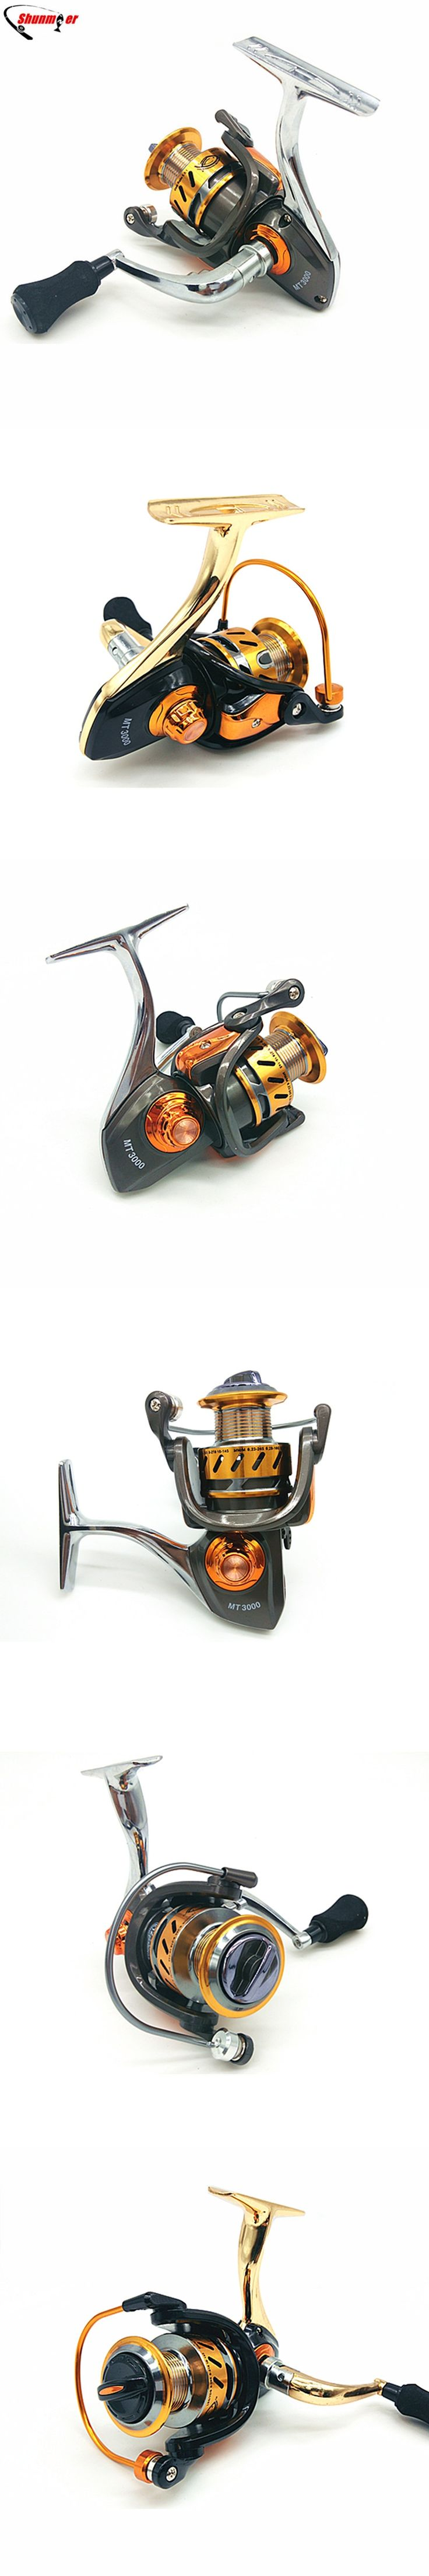 12 BB+1 fish ratio 5.2:1 Fishing Reel Spinning Reels Pesca Fishing Wheels Carretilha Para Molinete Peche Carretes Metal